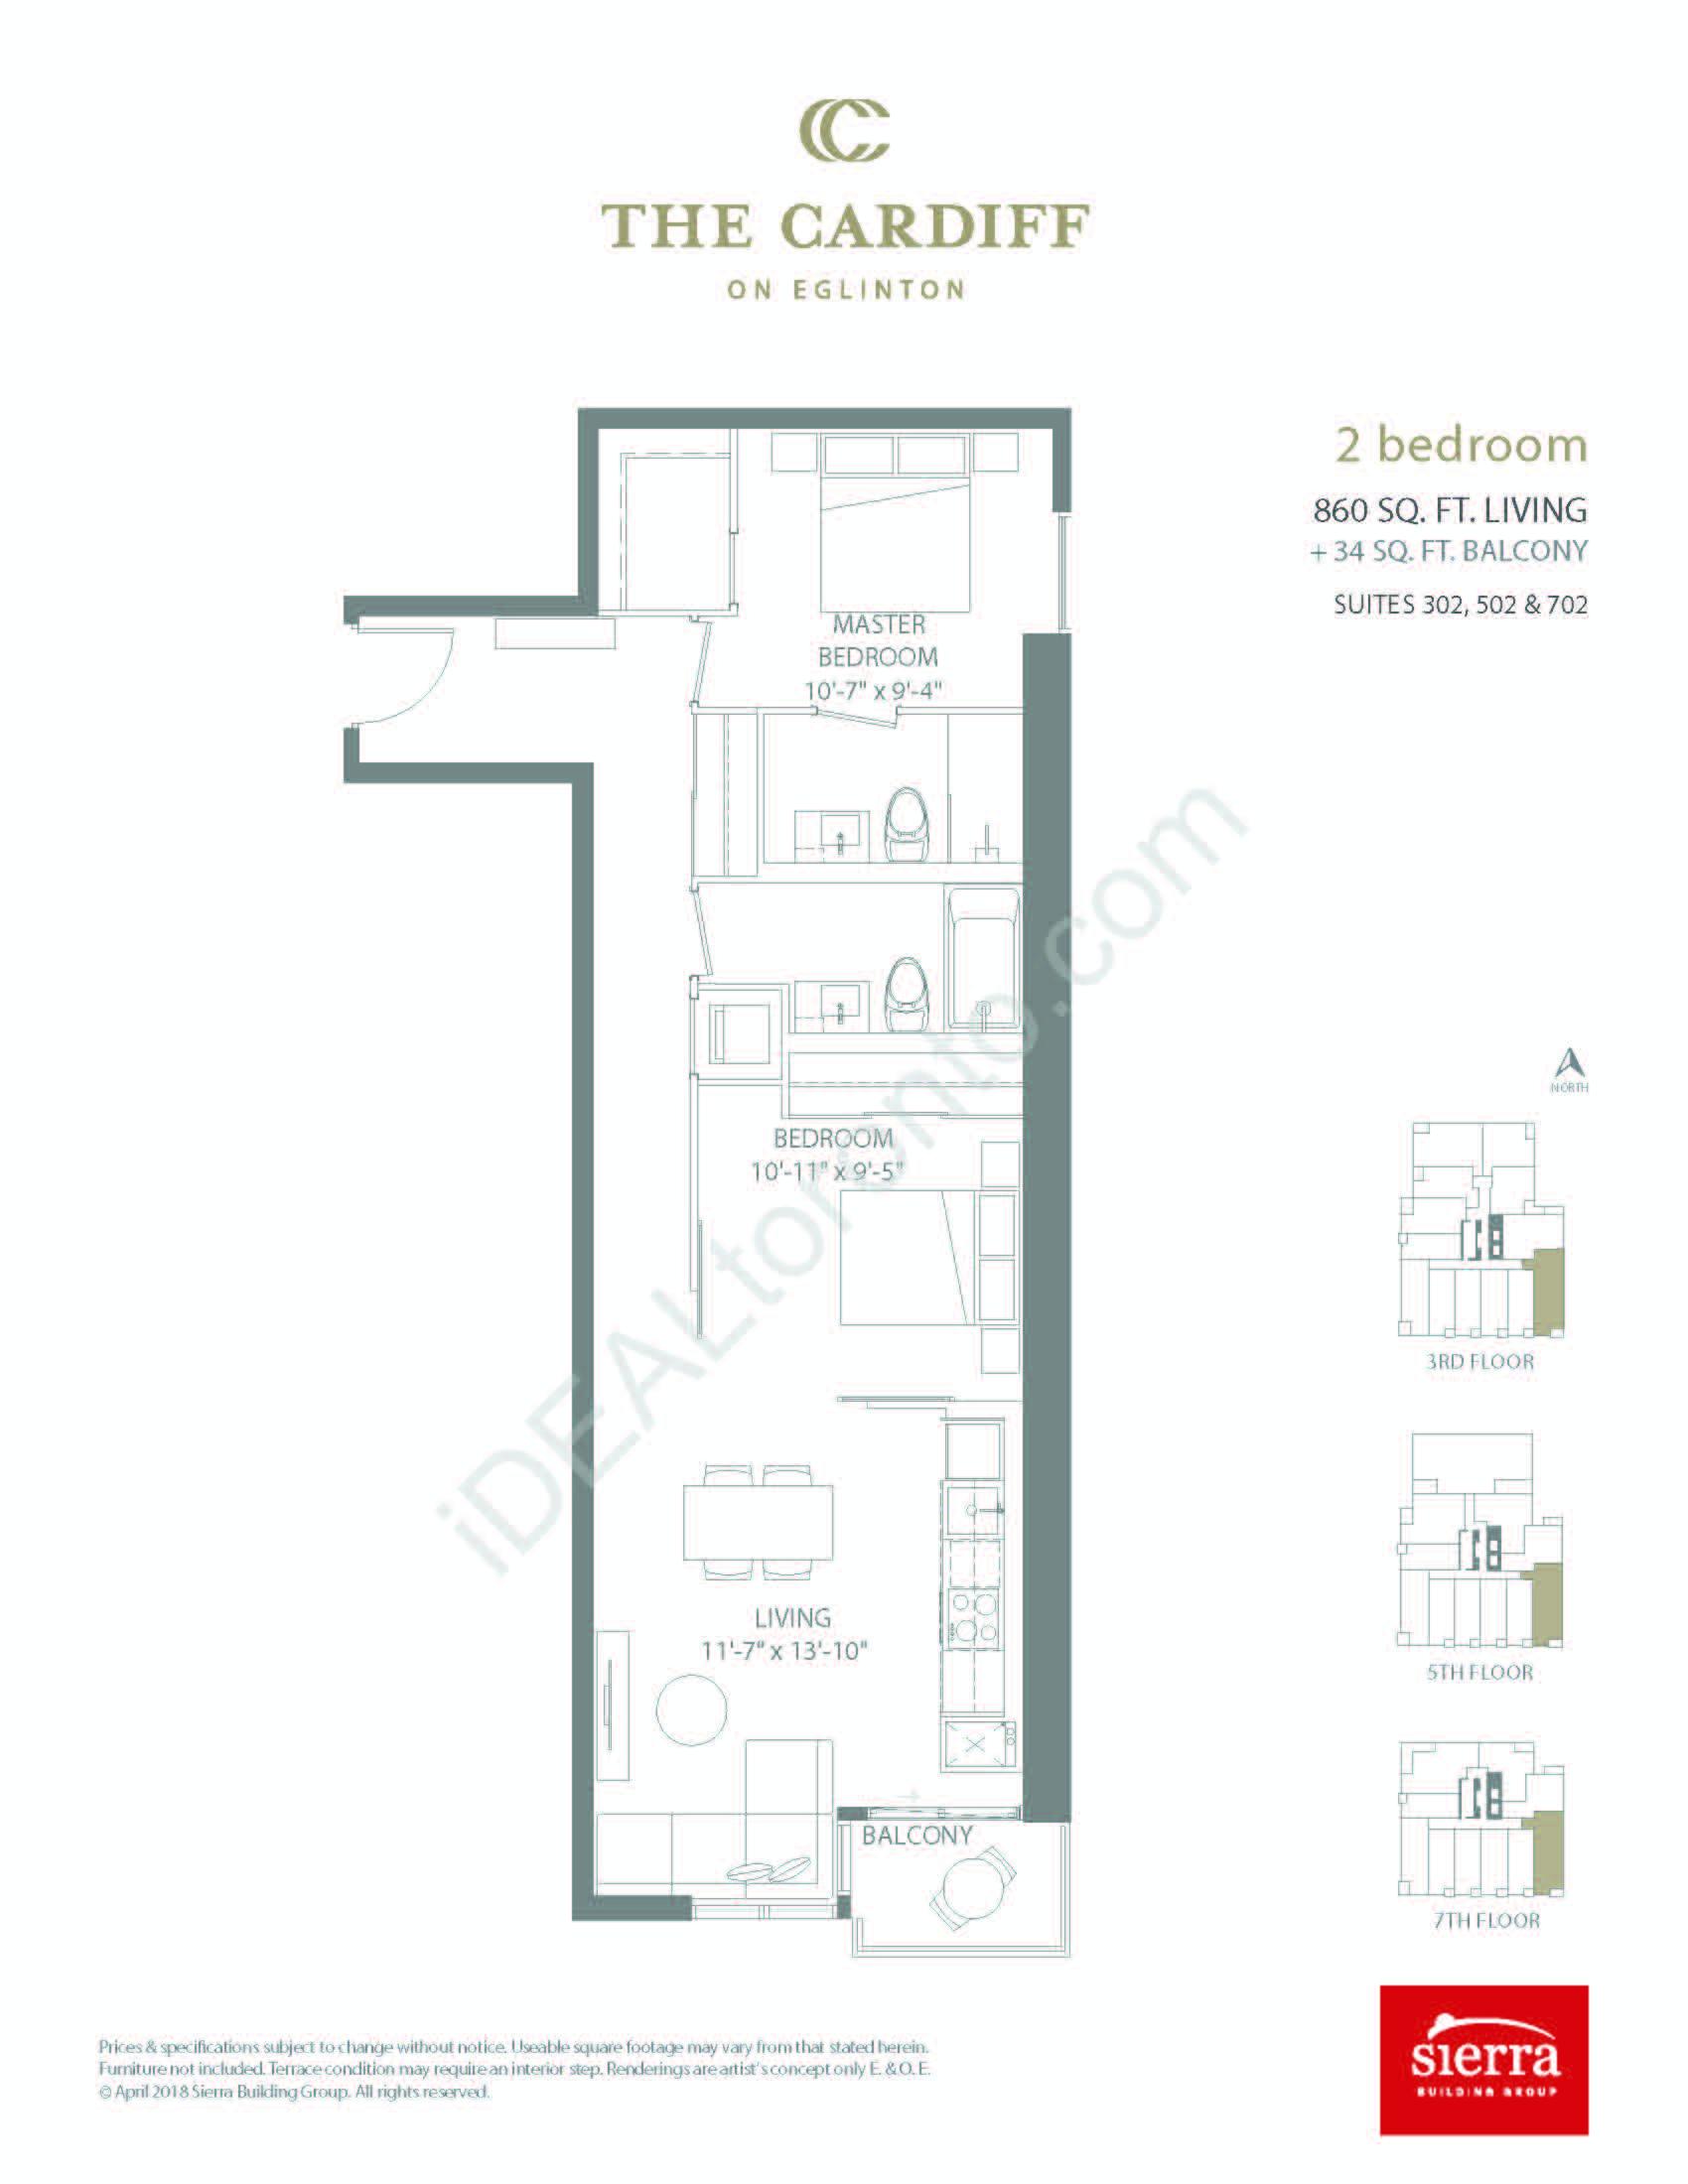 2 Bedroom + Balcony